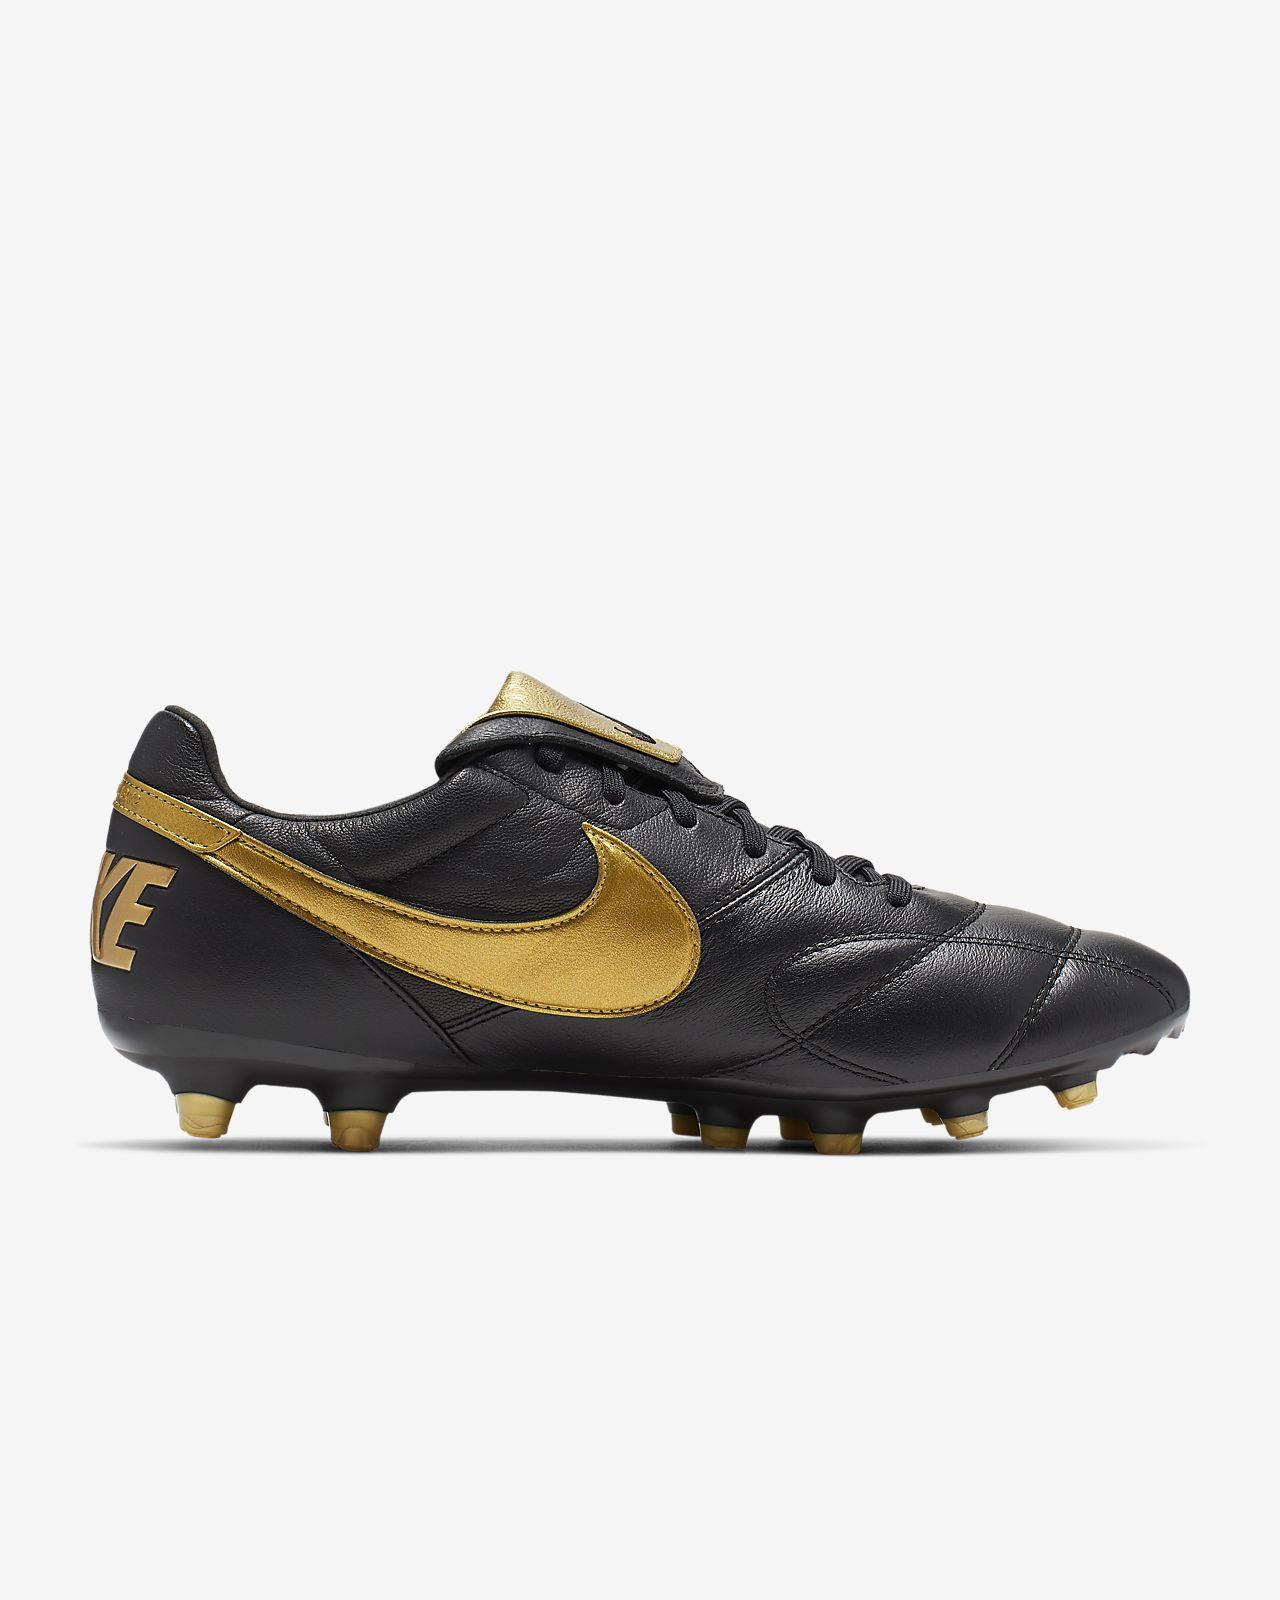 Nike Fg Pour Terrain Ii Premier De Sec Crampons À Chaussure Football wXnkP80O